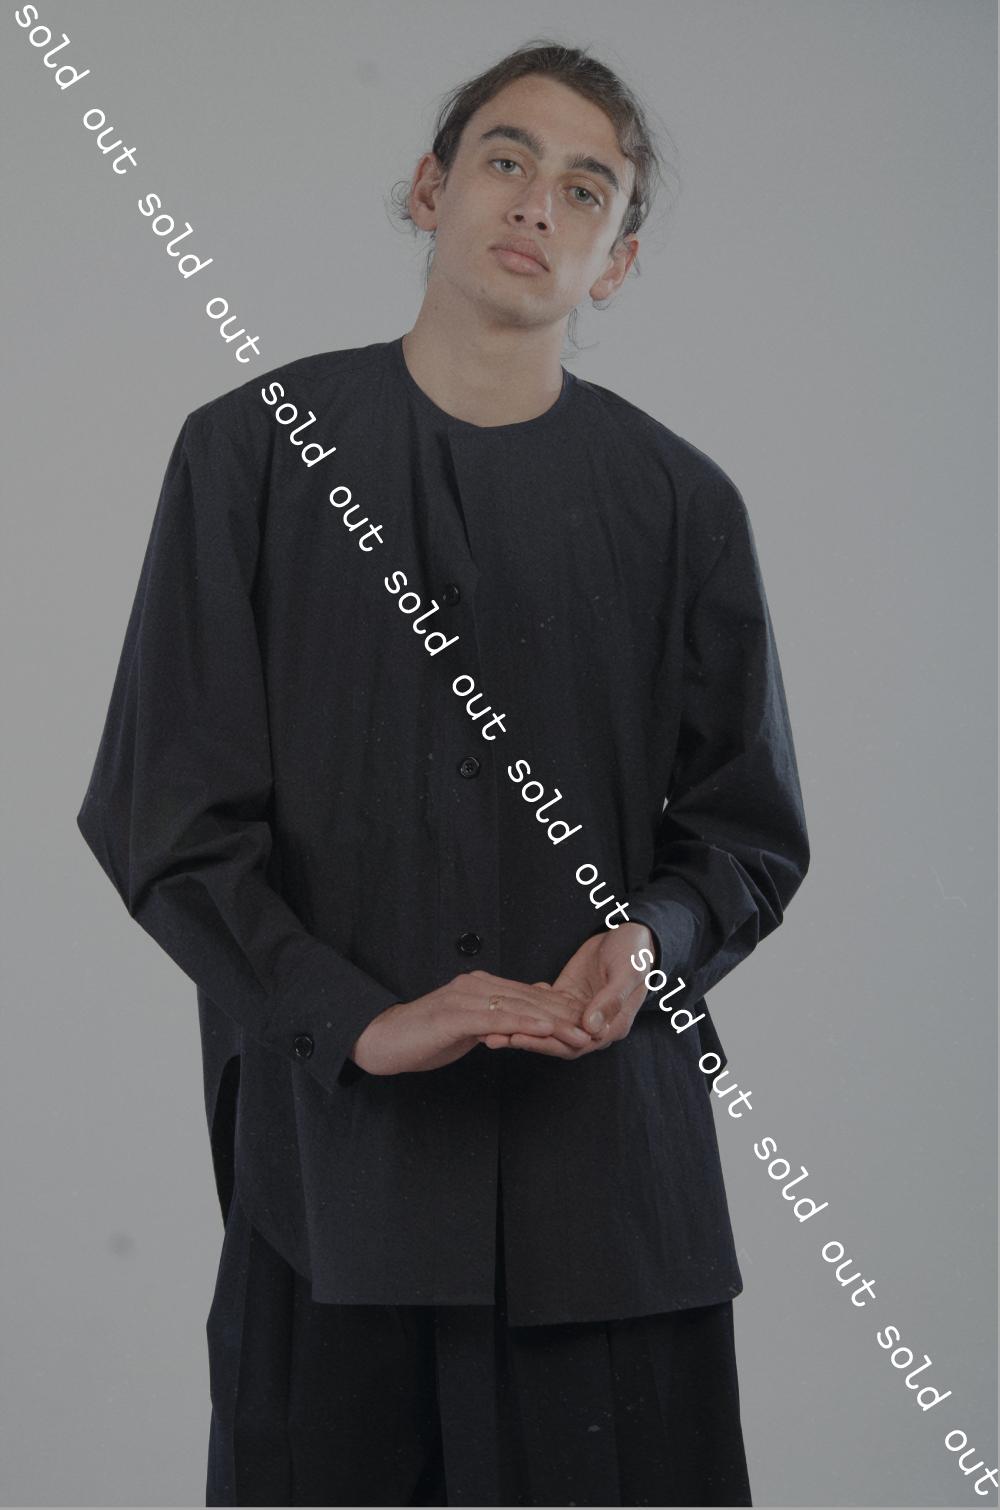 joseph-hollebon-collarless-shirt-agoraphobia-collective